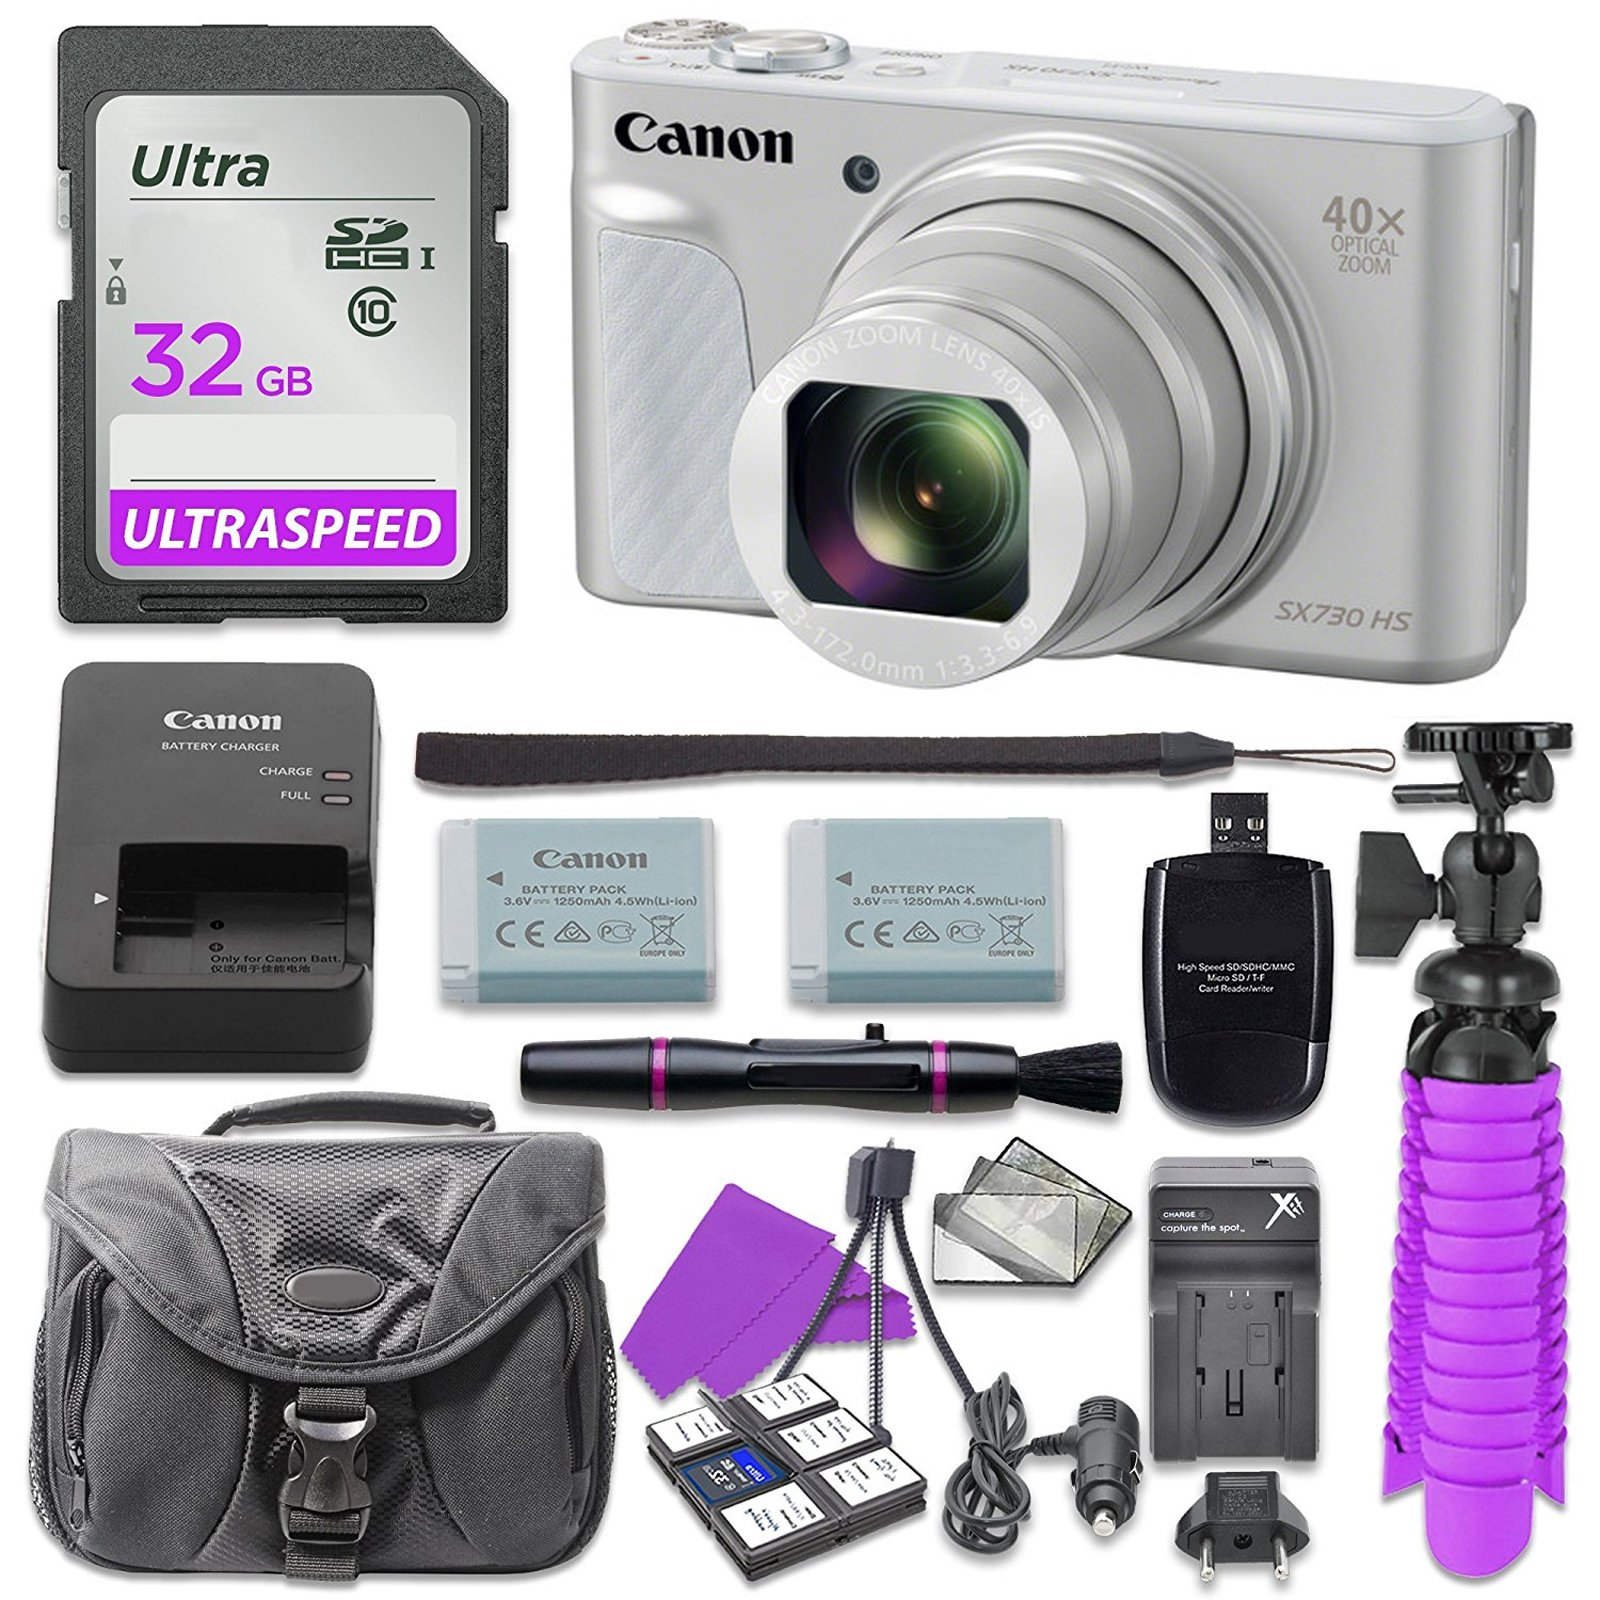 Canon PowerShot SX730 (Silver) Digital Camera with 32GB SD Memory Card + Accessory Bundle